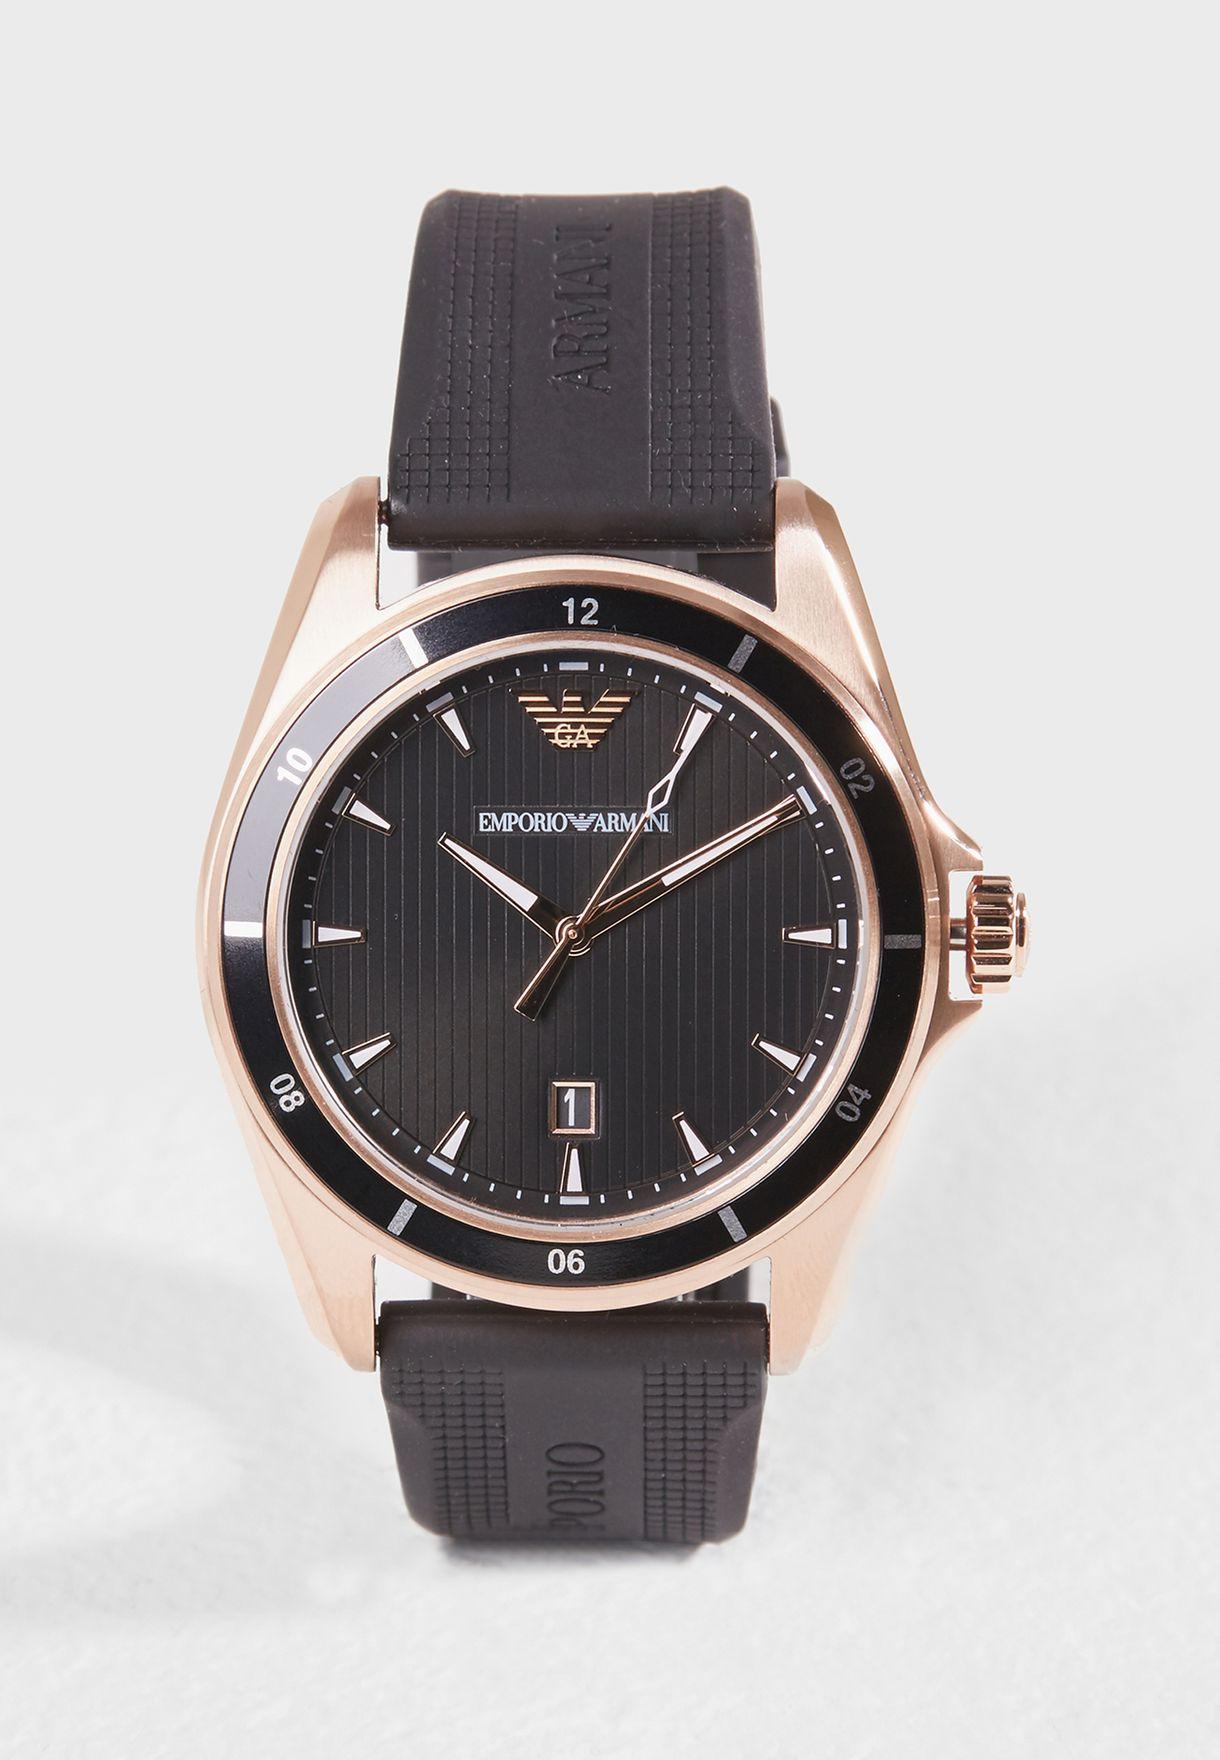 2f4802d12 تسوق ساعة انالوج ماركة امبريو ارماني لون أسود AR11101 في عمان ...